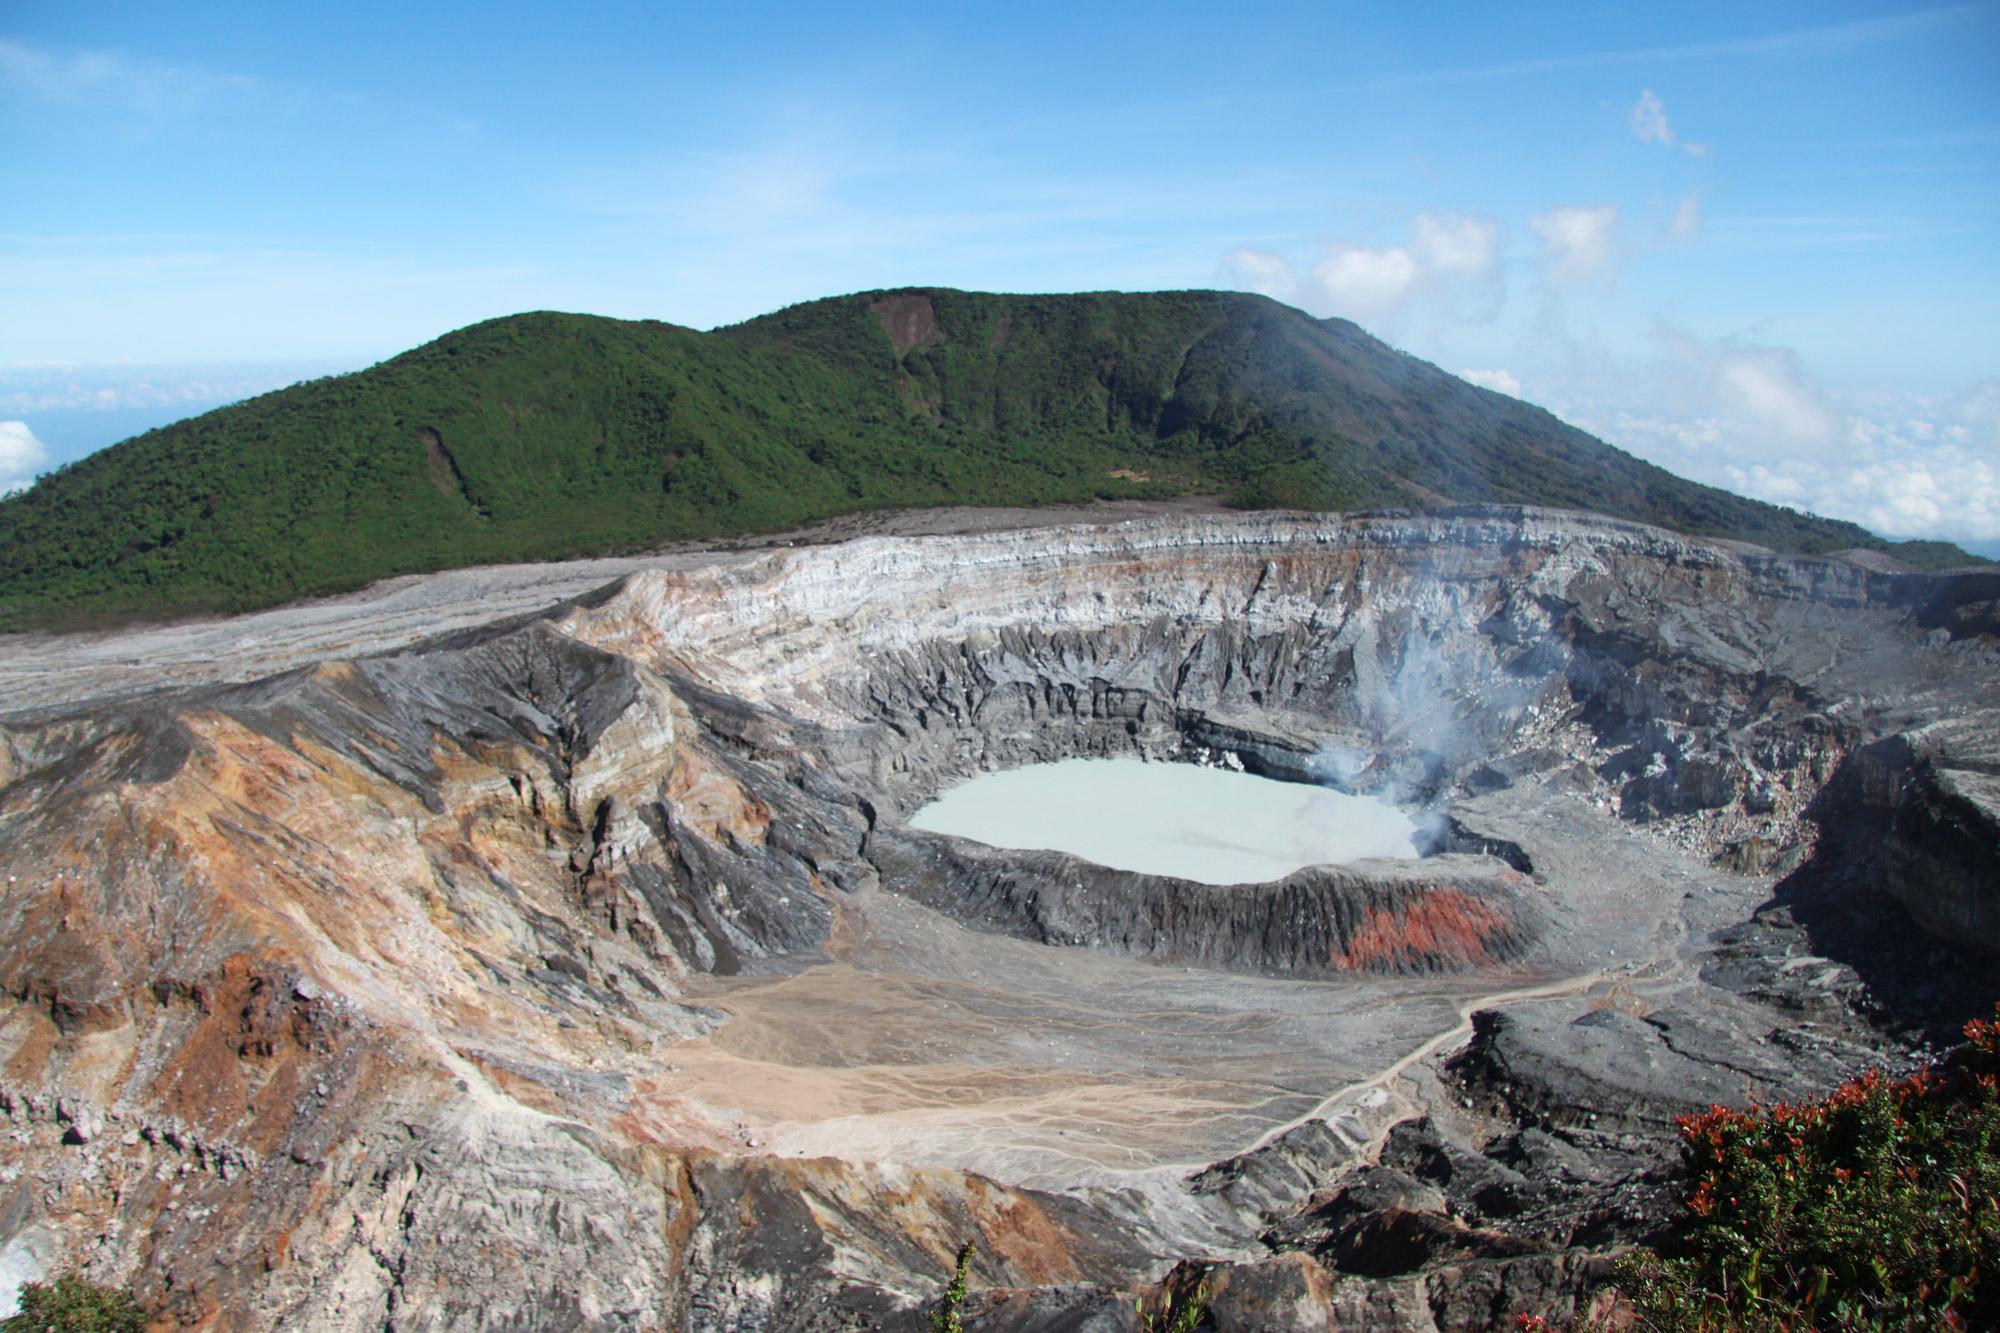 Costa Rica 2014 - dag 7 - Volcán Poás